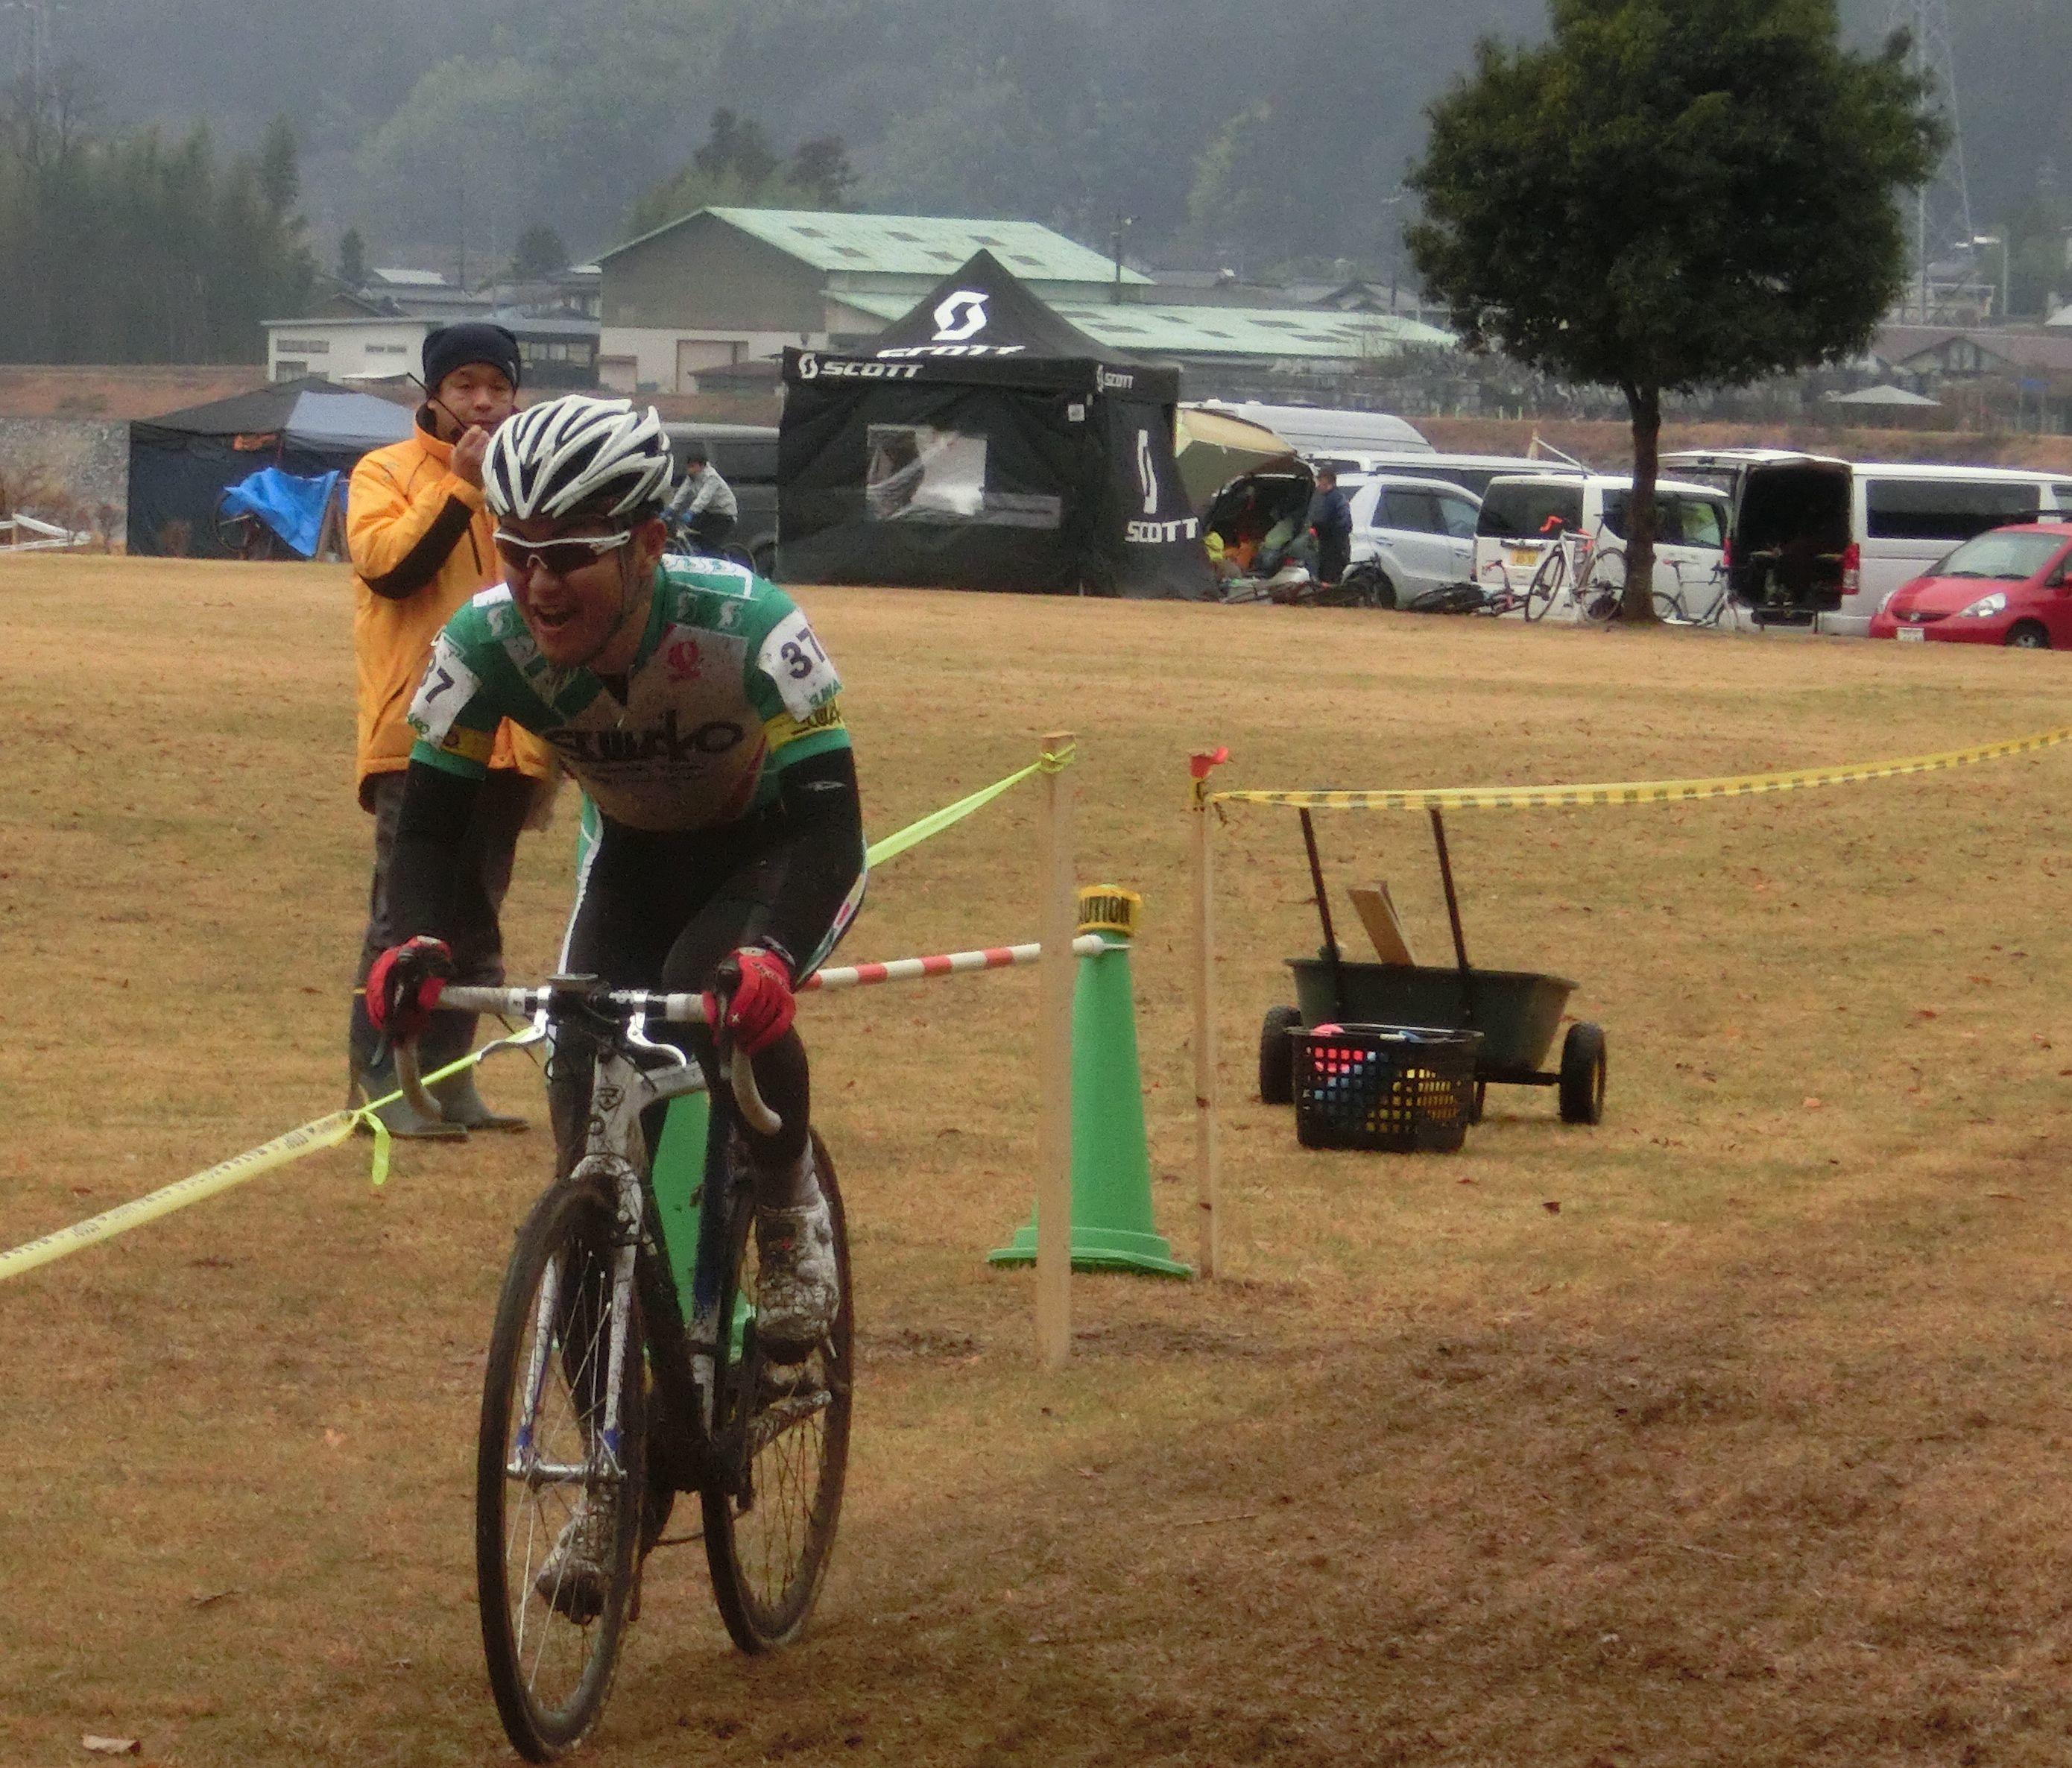 https://www.cyclocross.jp/news/2018_1223CCM188Minamishinsyu0139.JPG